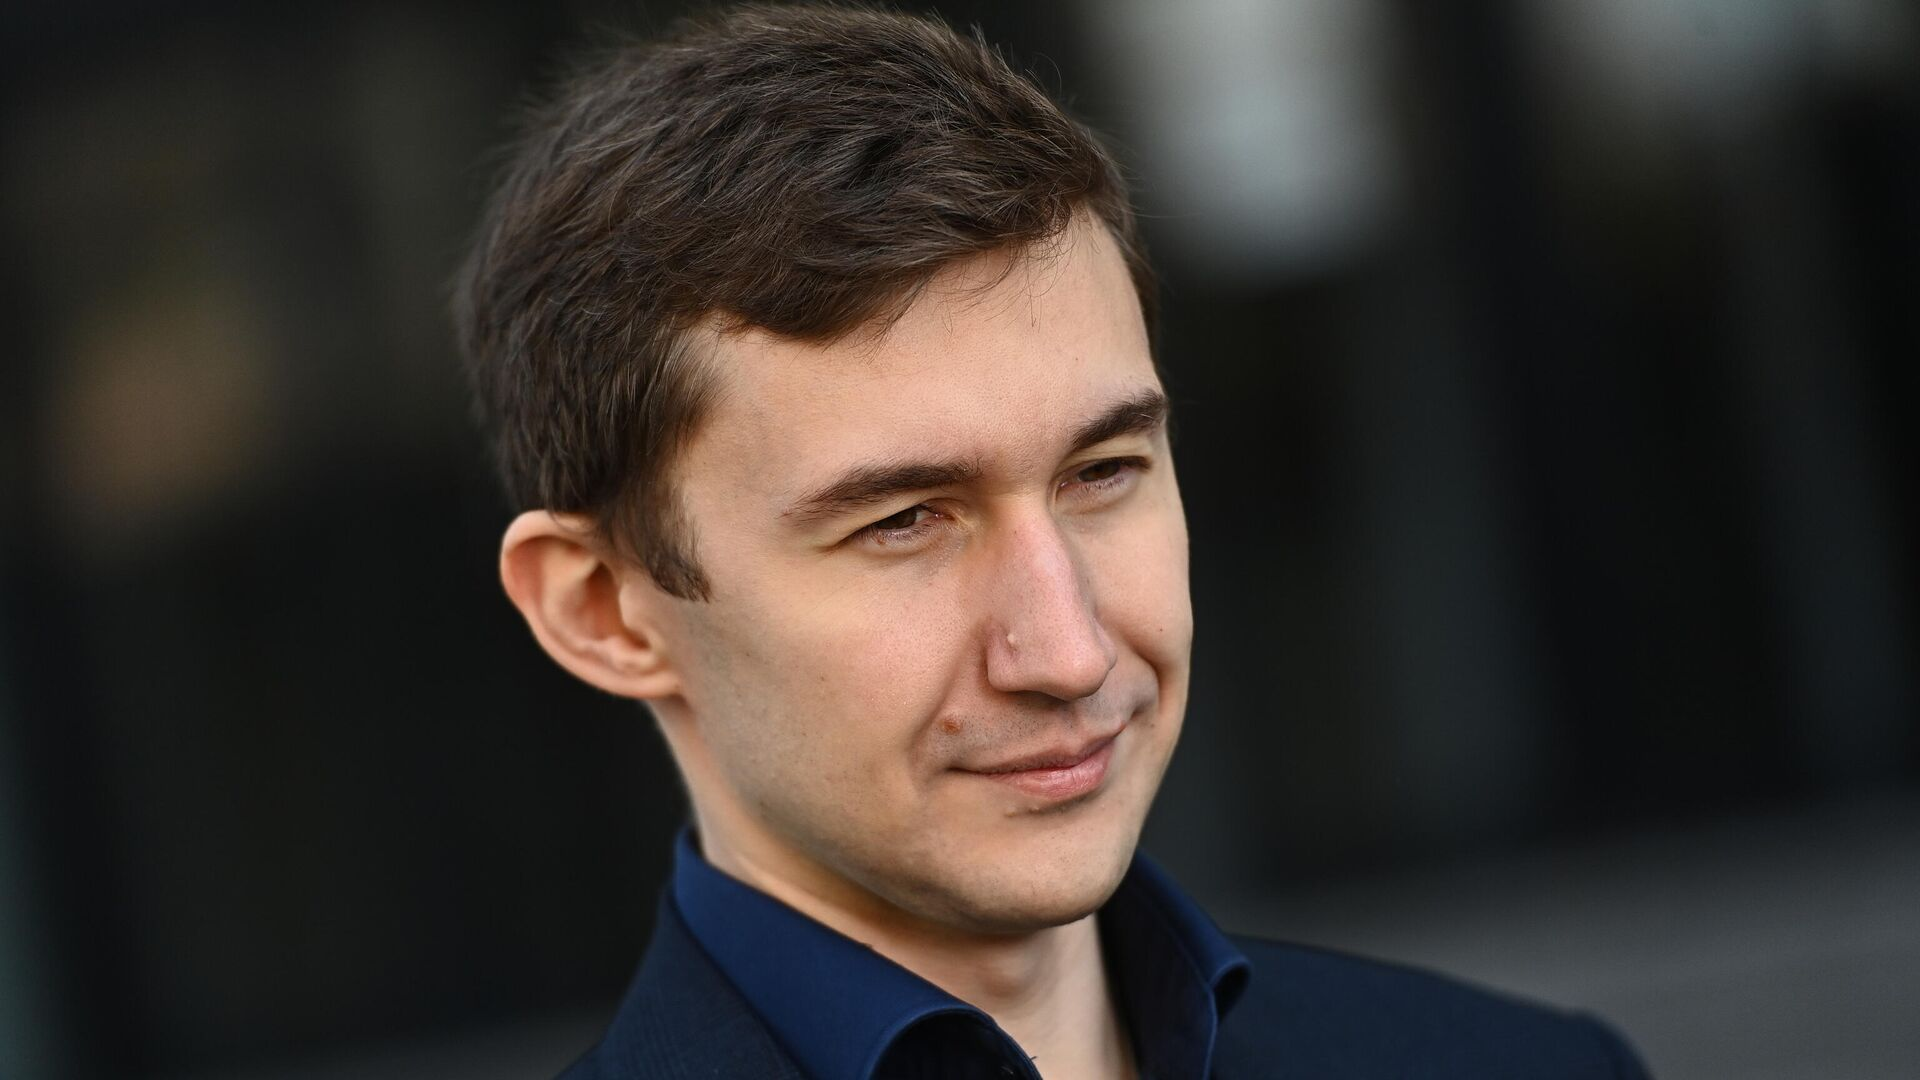 Турнир претендентов по шахматам возобновится с 19 апреля - РИА Новости, 1920, 22.07.2021